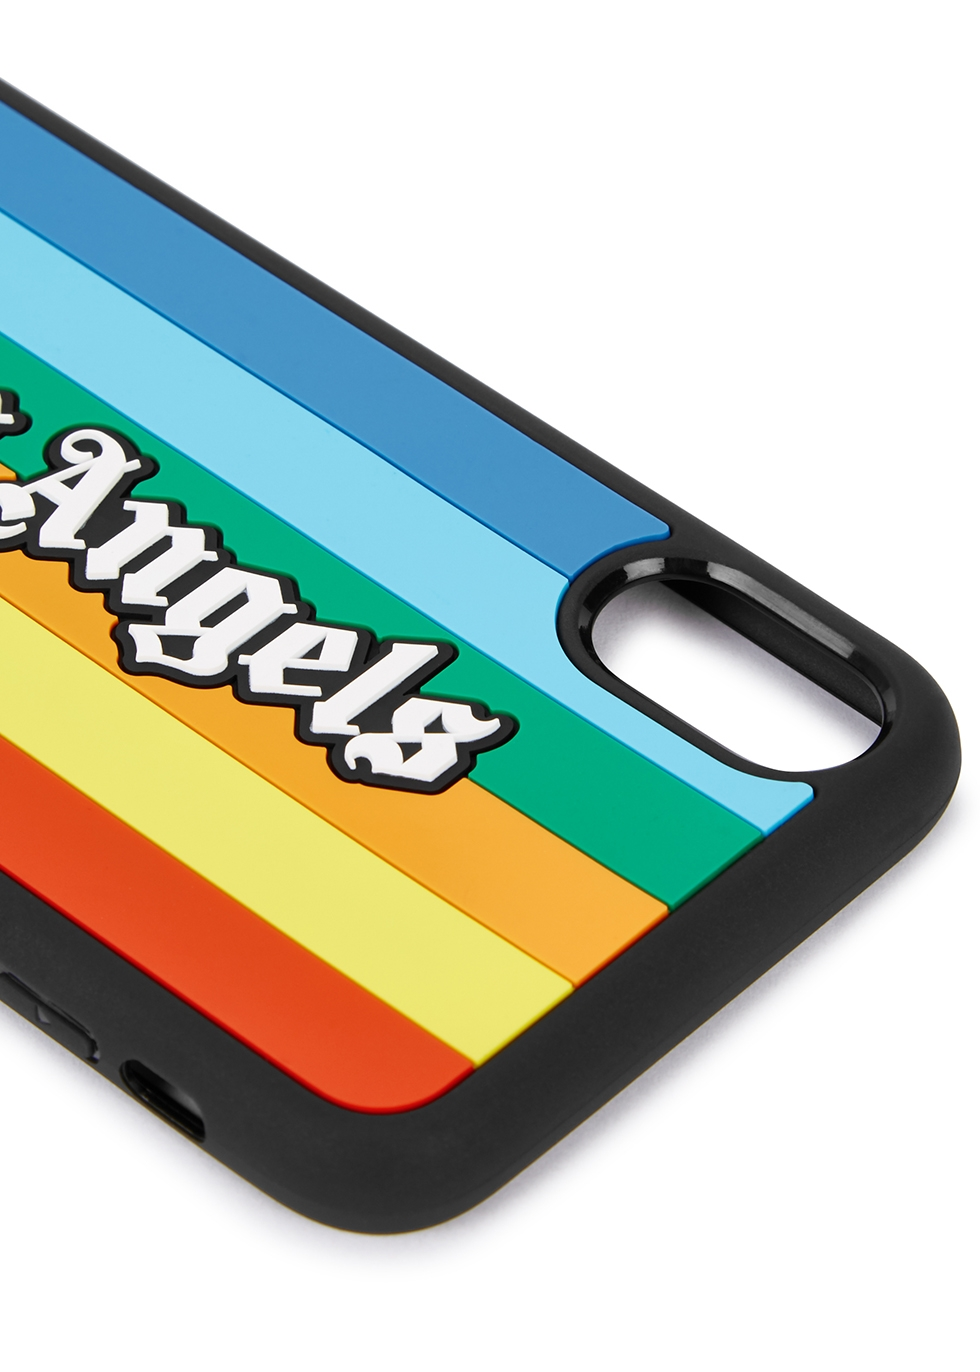 Rainbow logo iPhone X case - Palm Angels